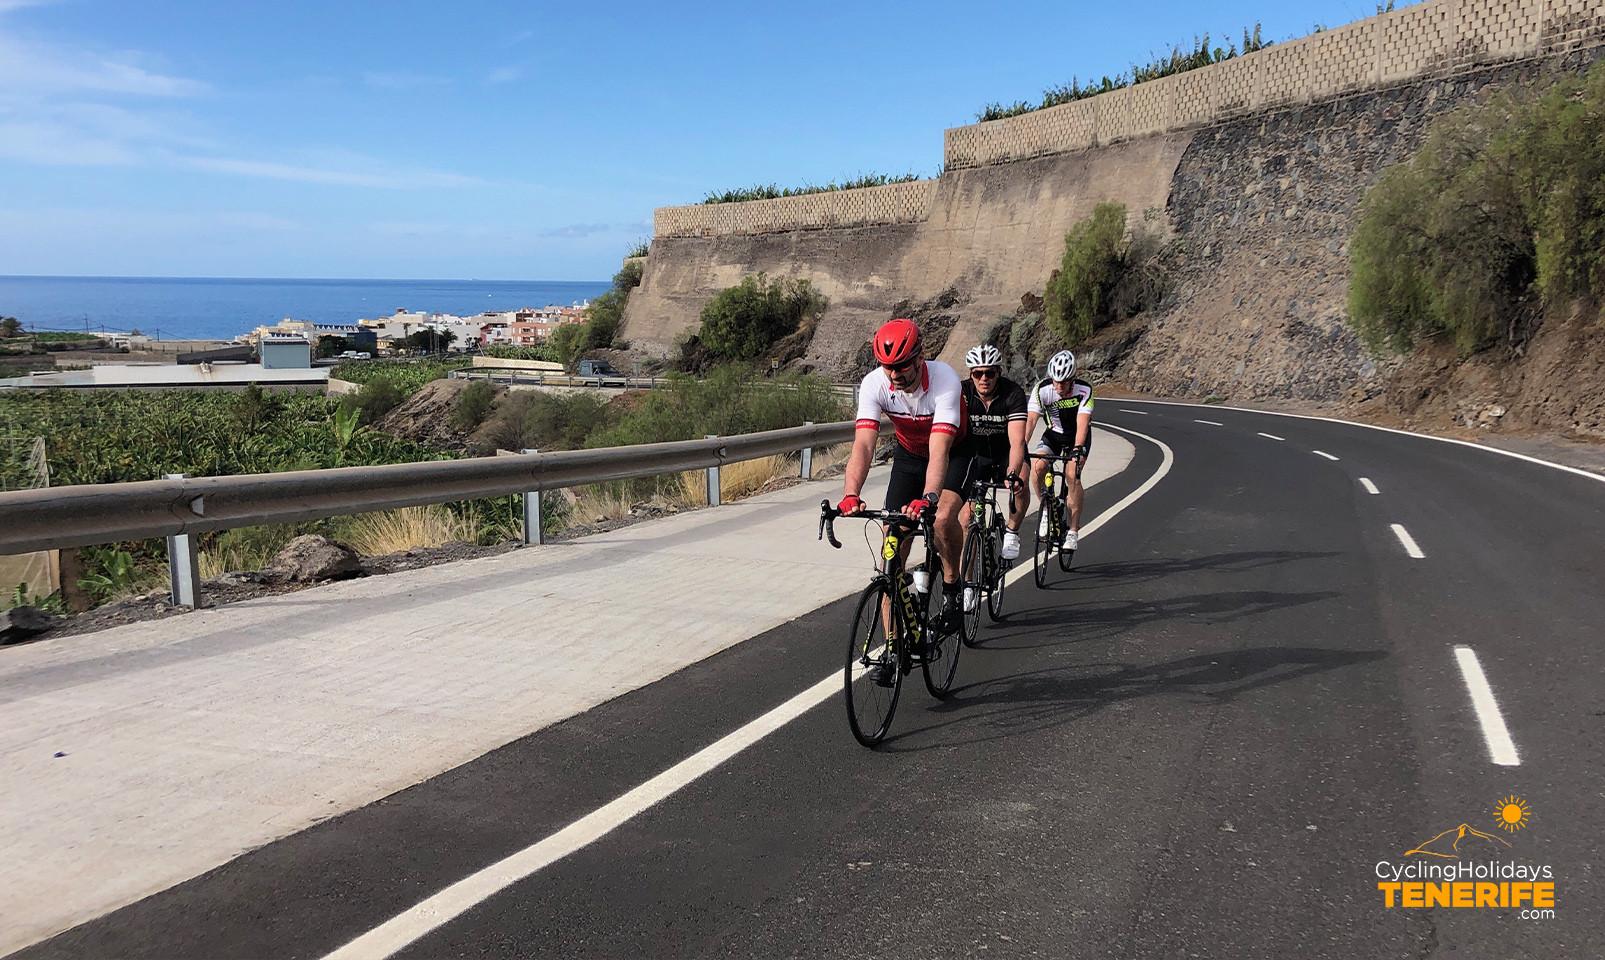 canary islands cycling.jpg